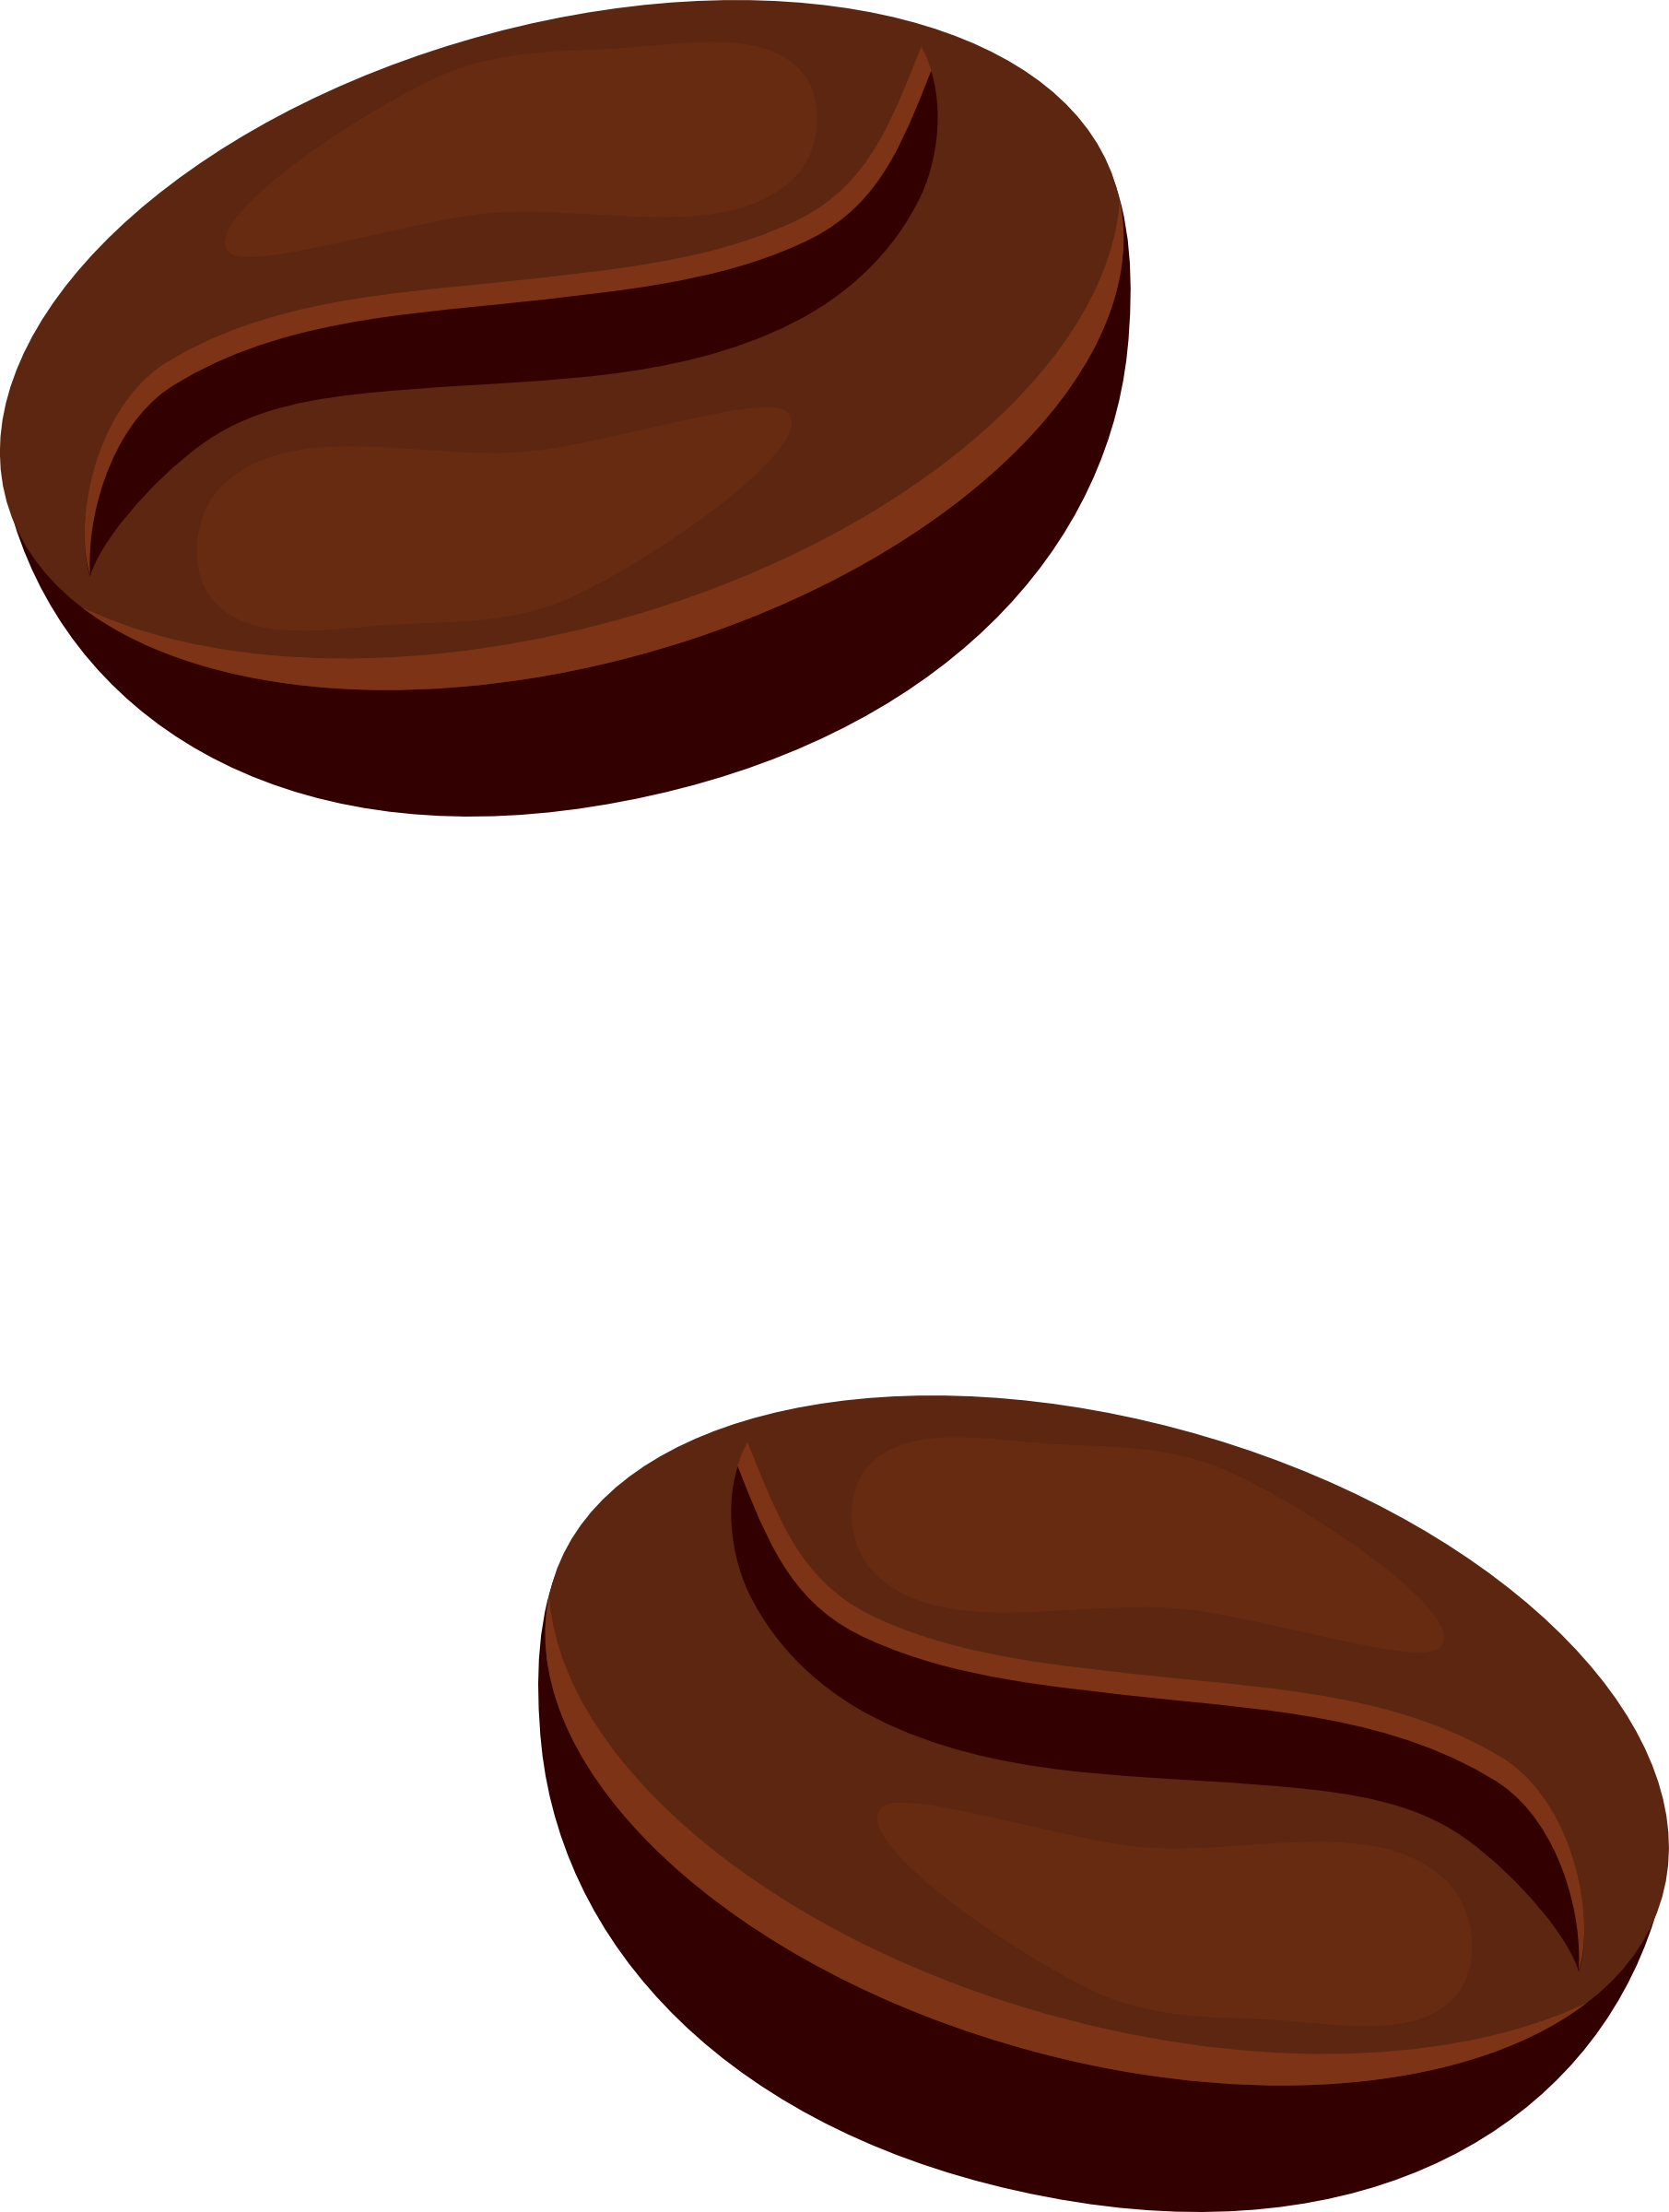 Coffee Beans Clipart-coffee beans clipart-3